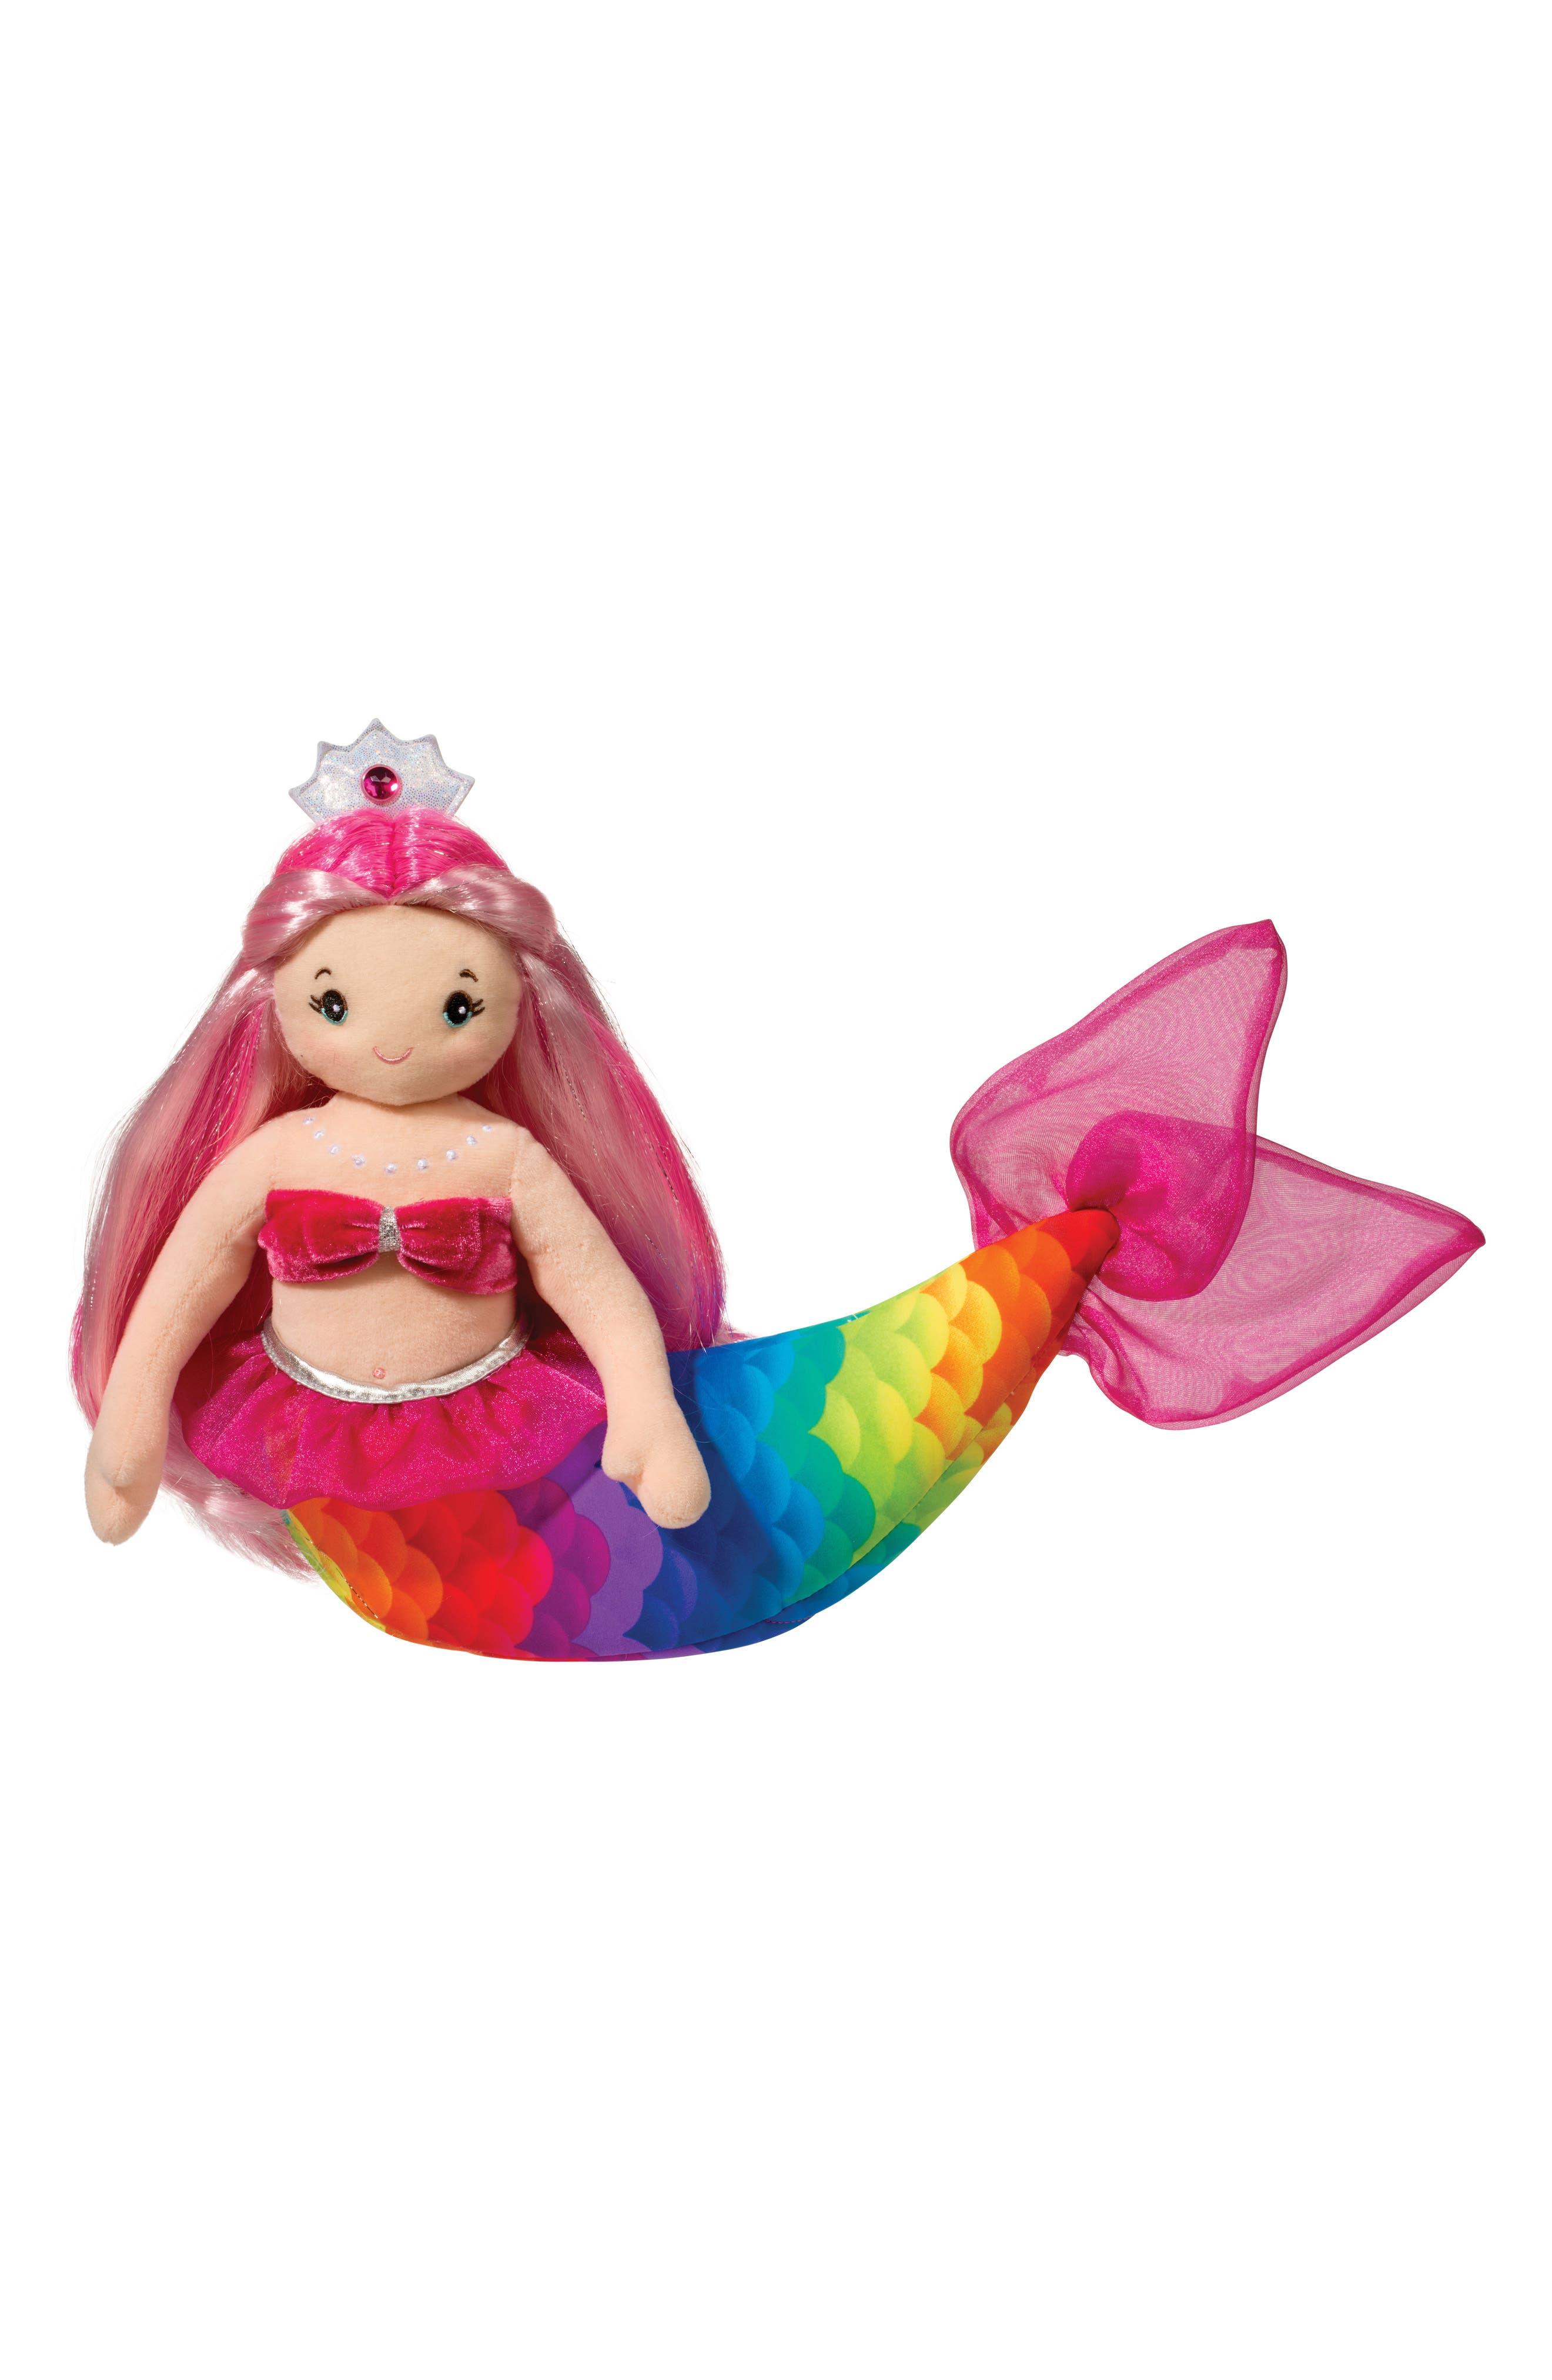 Arissa - Large Rainbow Mermaid Doll,                             Main thumbnail 1, color,                             650